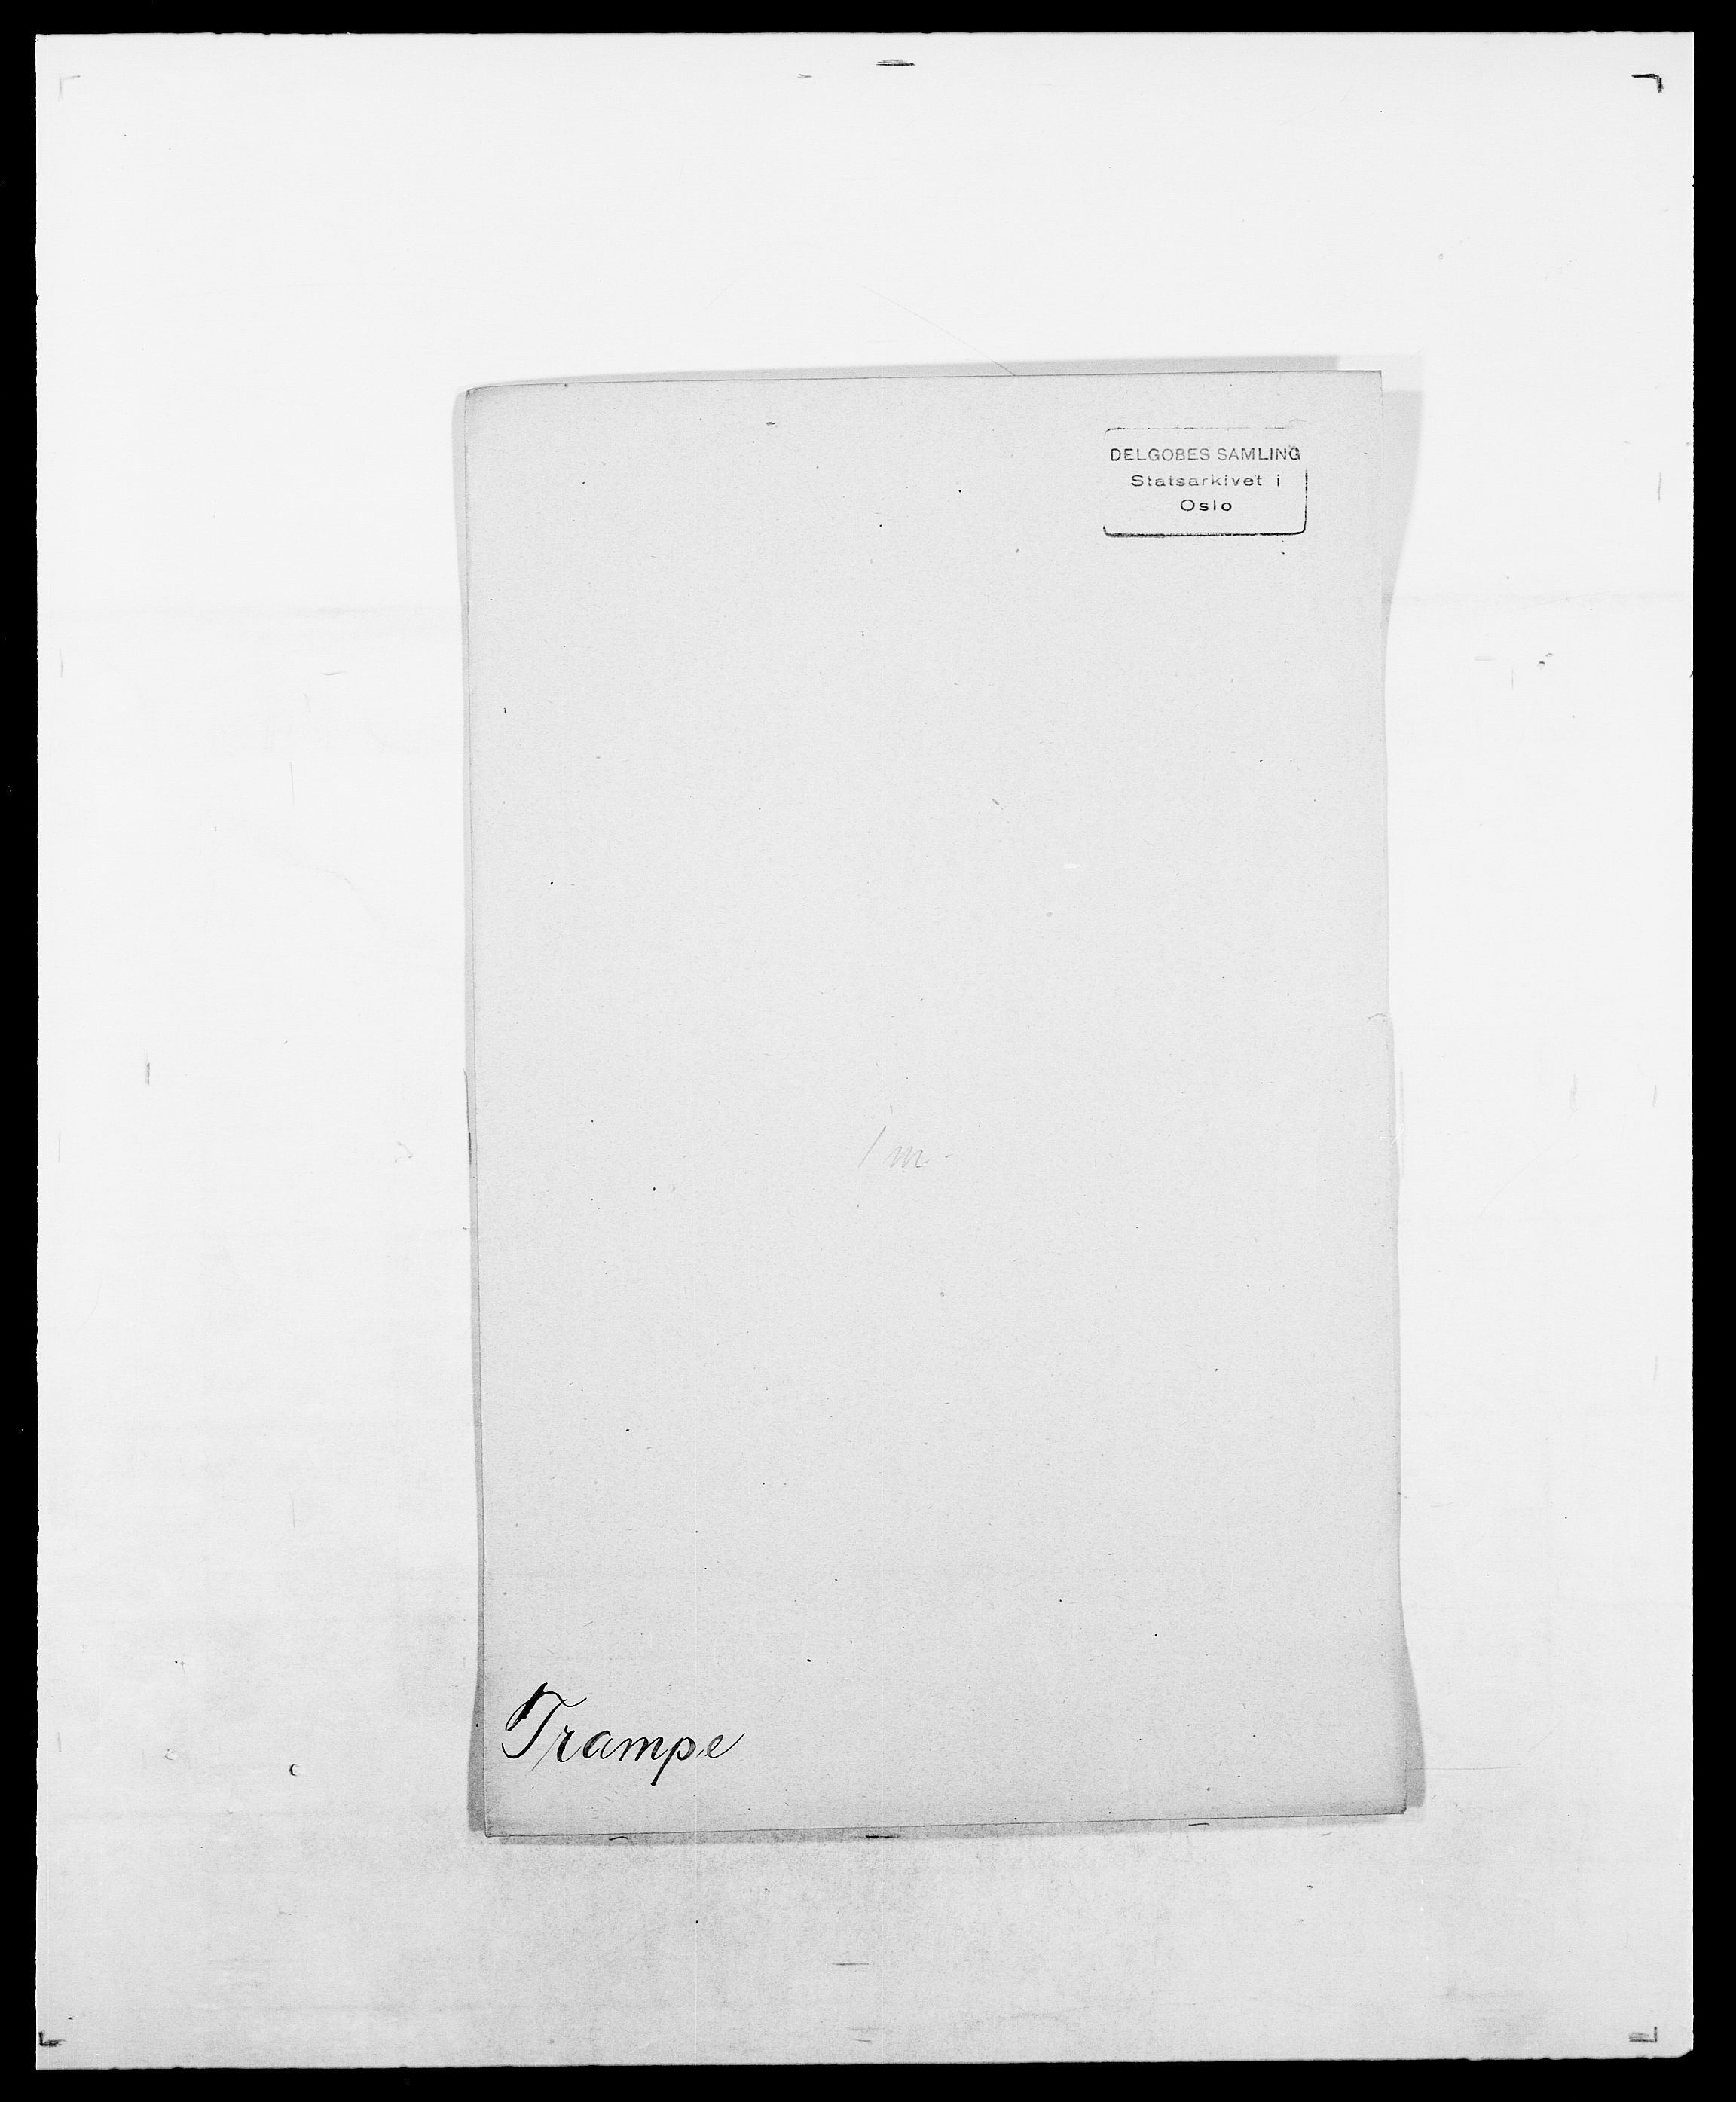 SAO, Delgobe, Charles Antoine - samling, D/Da/L0039: Thorsen - Urup, s. 289